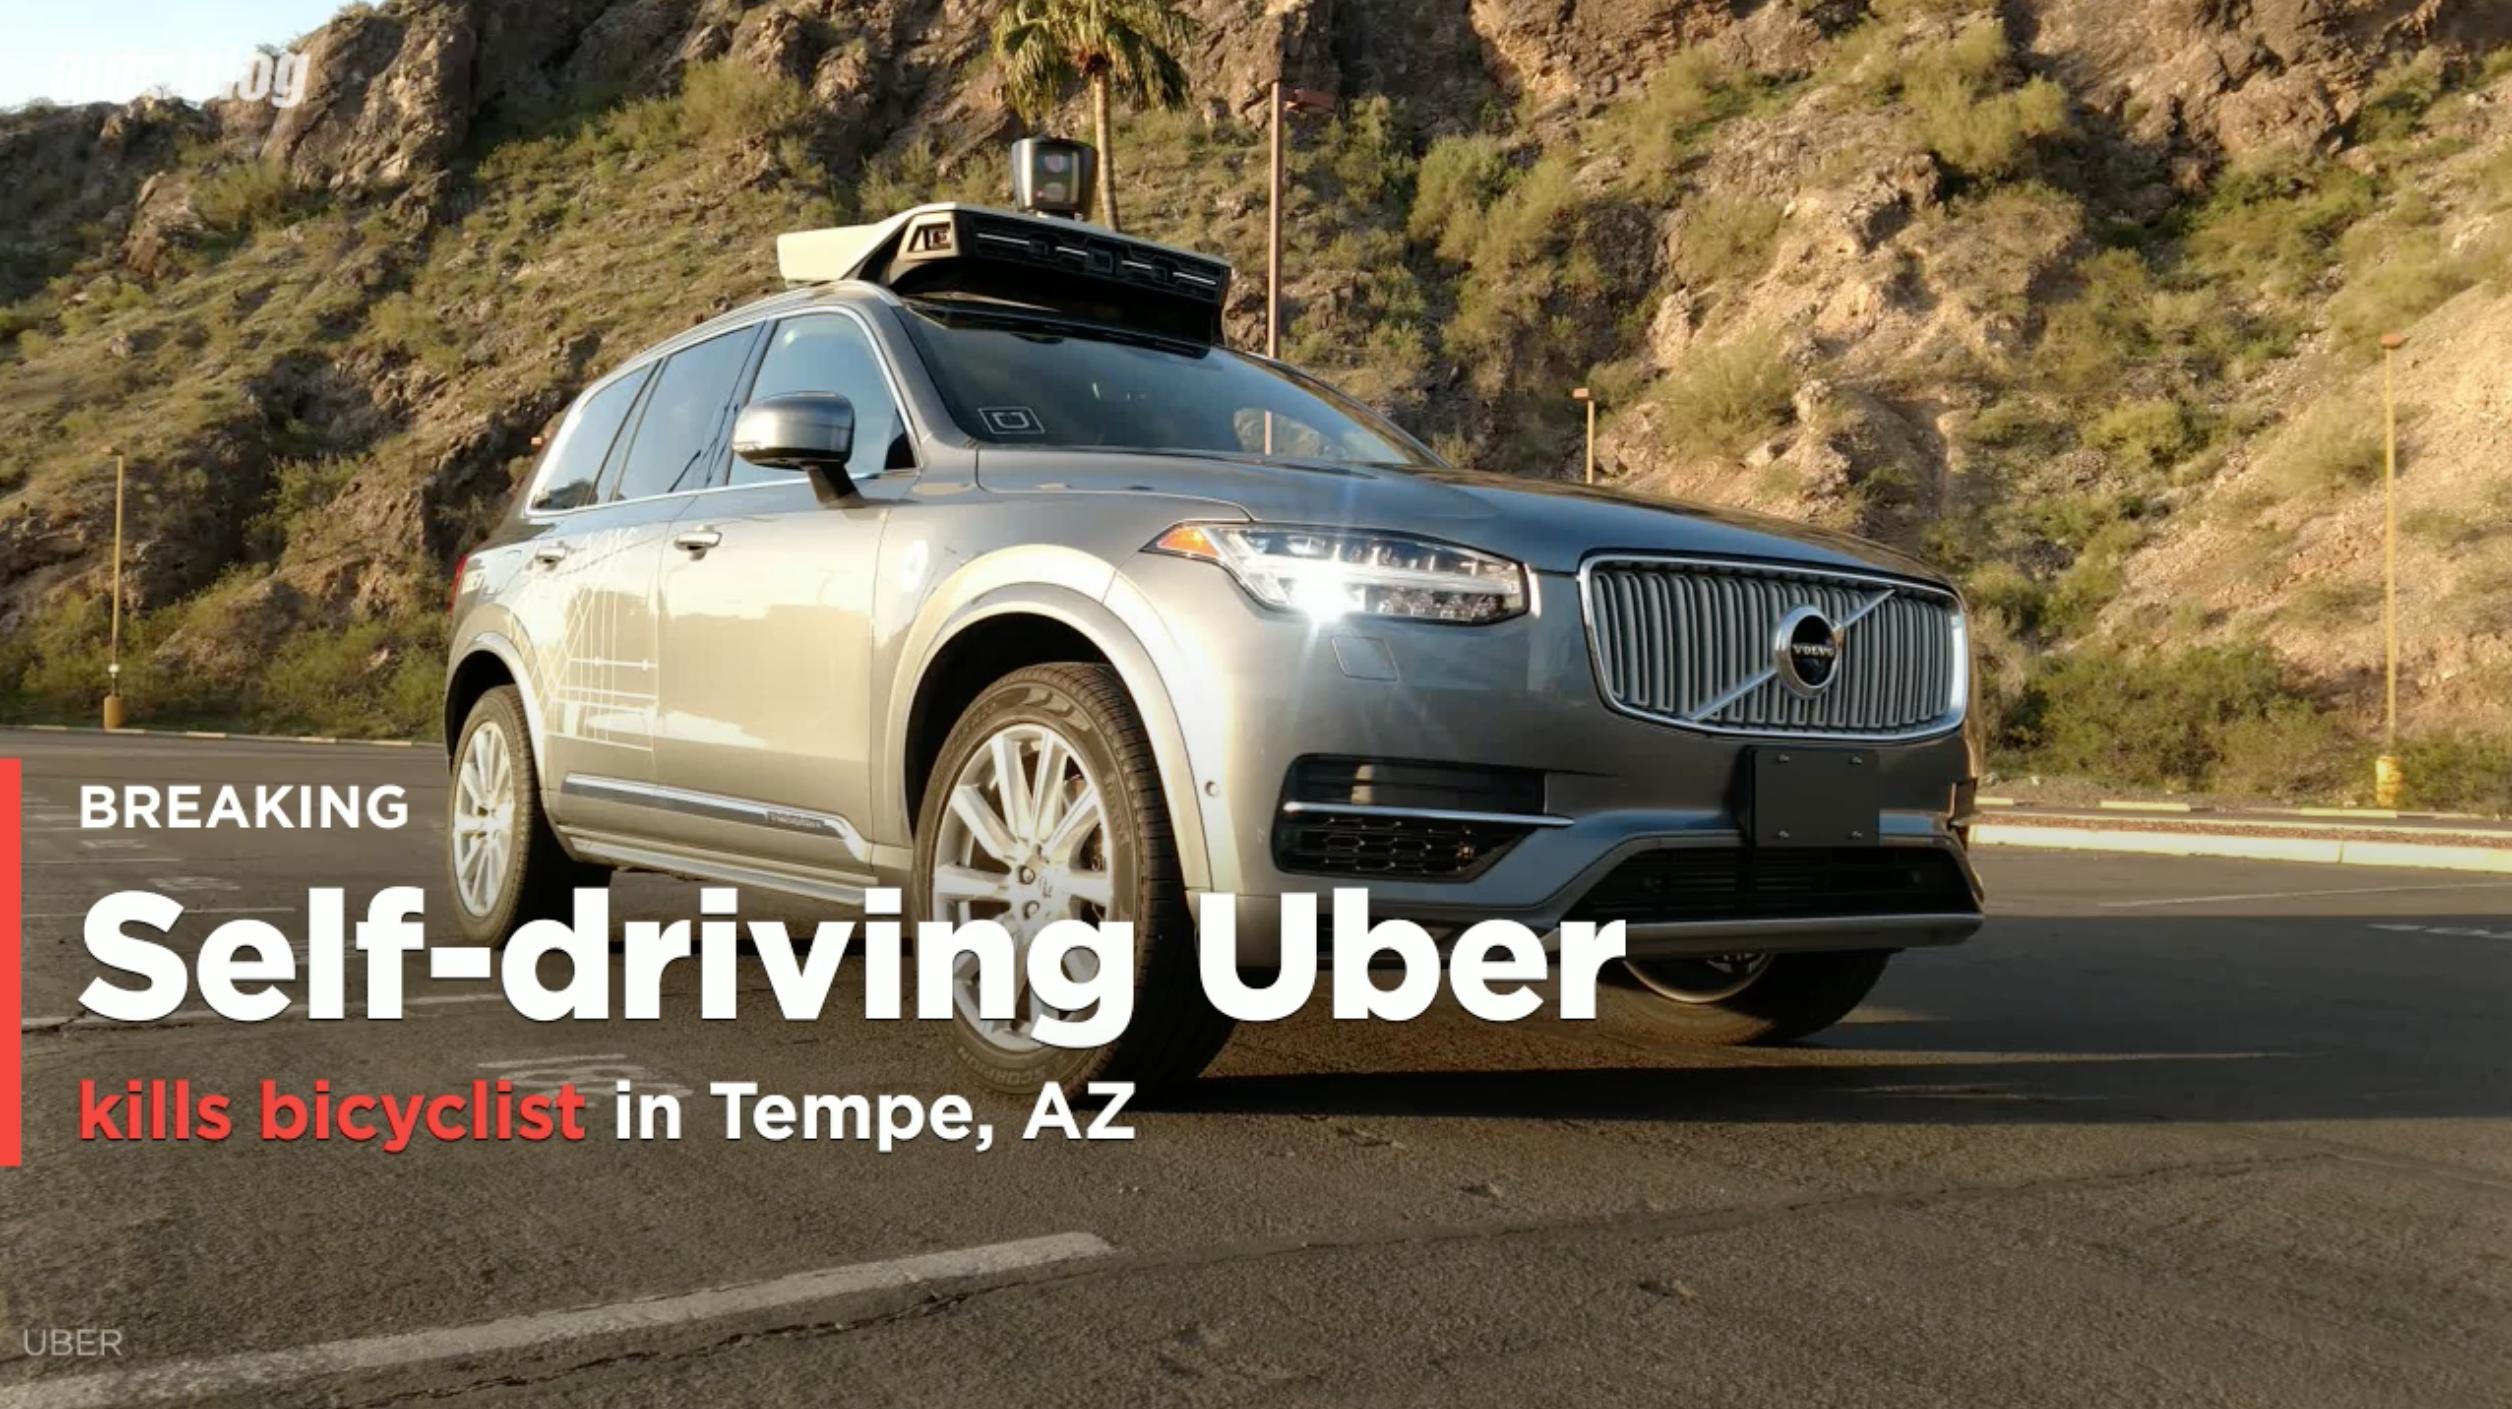 Uber suspends autonomous vehicle testing after Volvo kills bicyclist